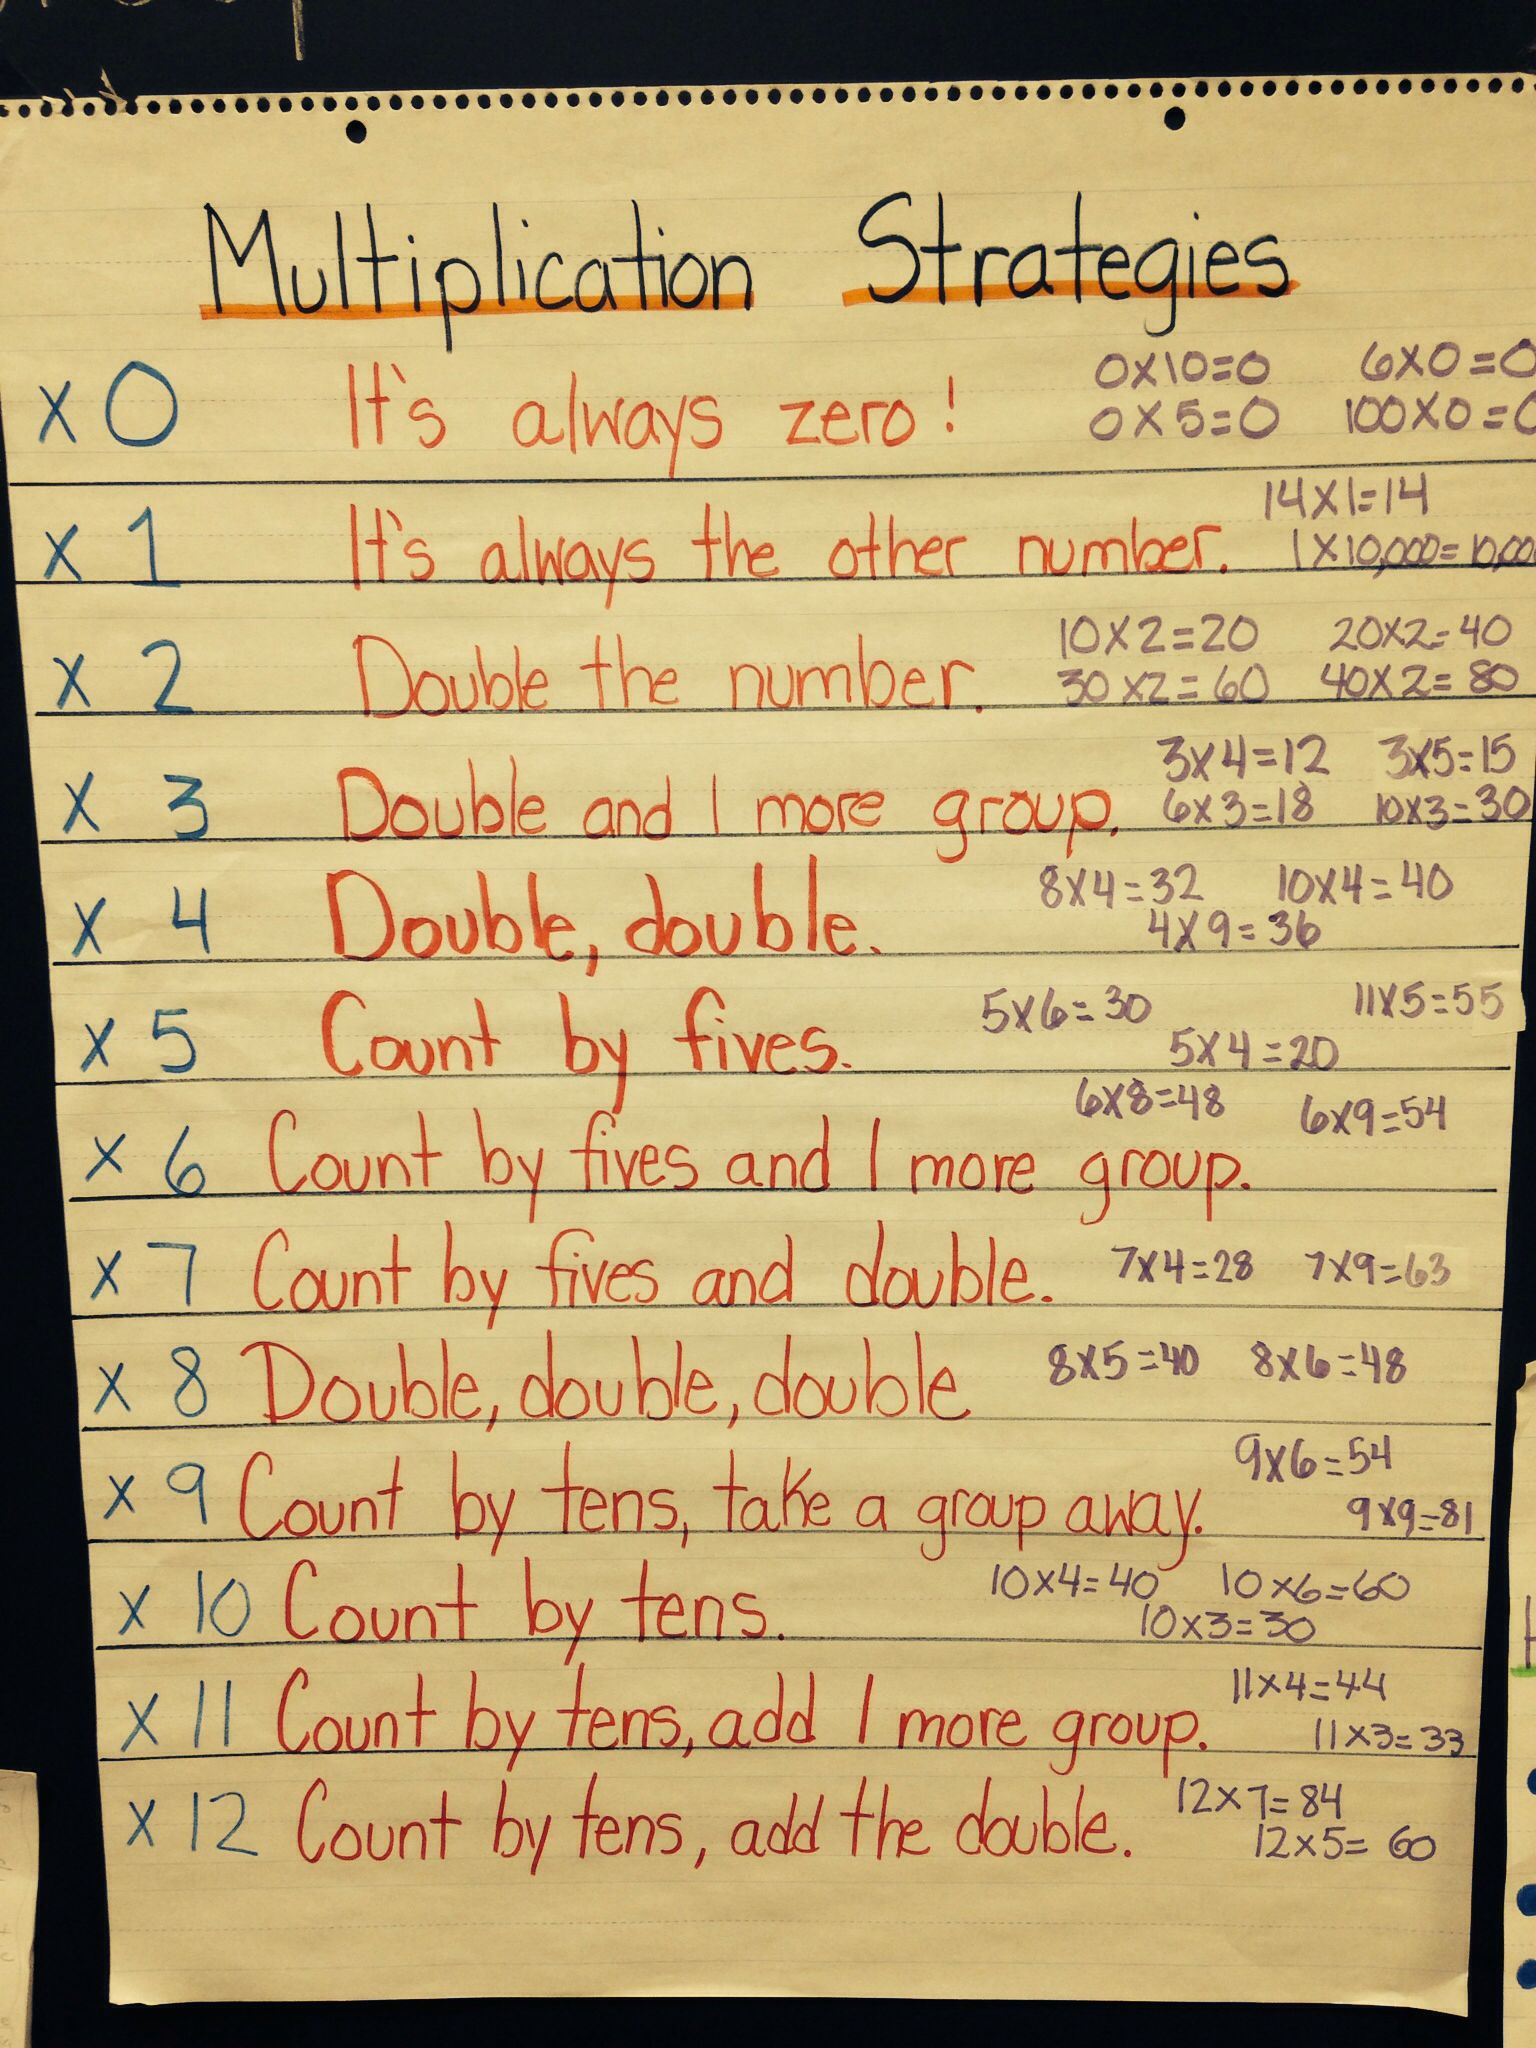 Multiplication fact strategies math multiplication division chart multiplication fact strategies geenschuldenfo Gallery